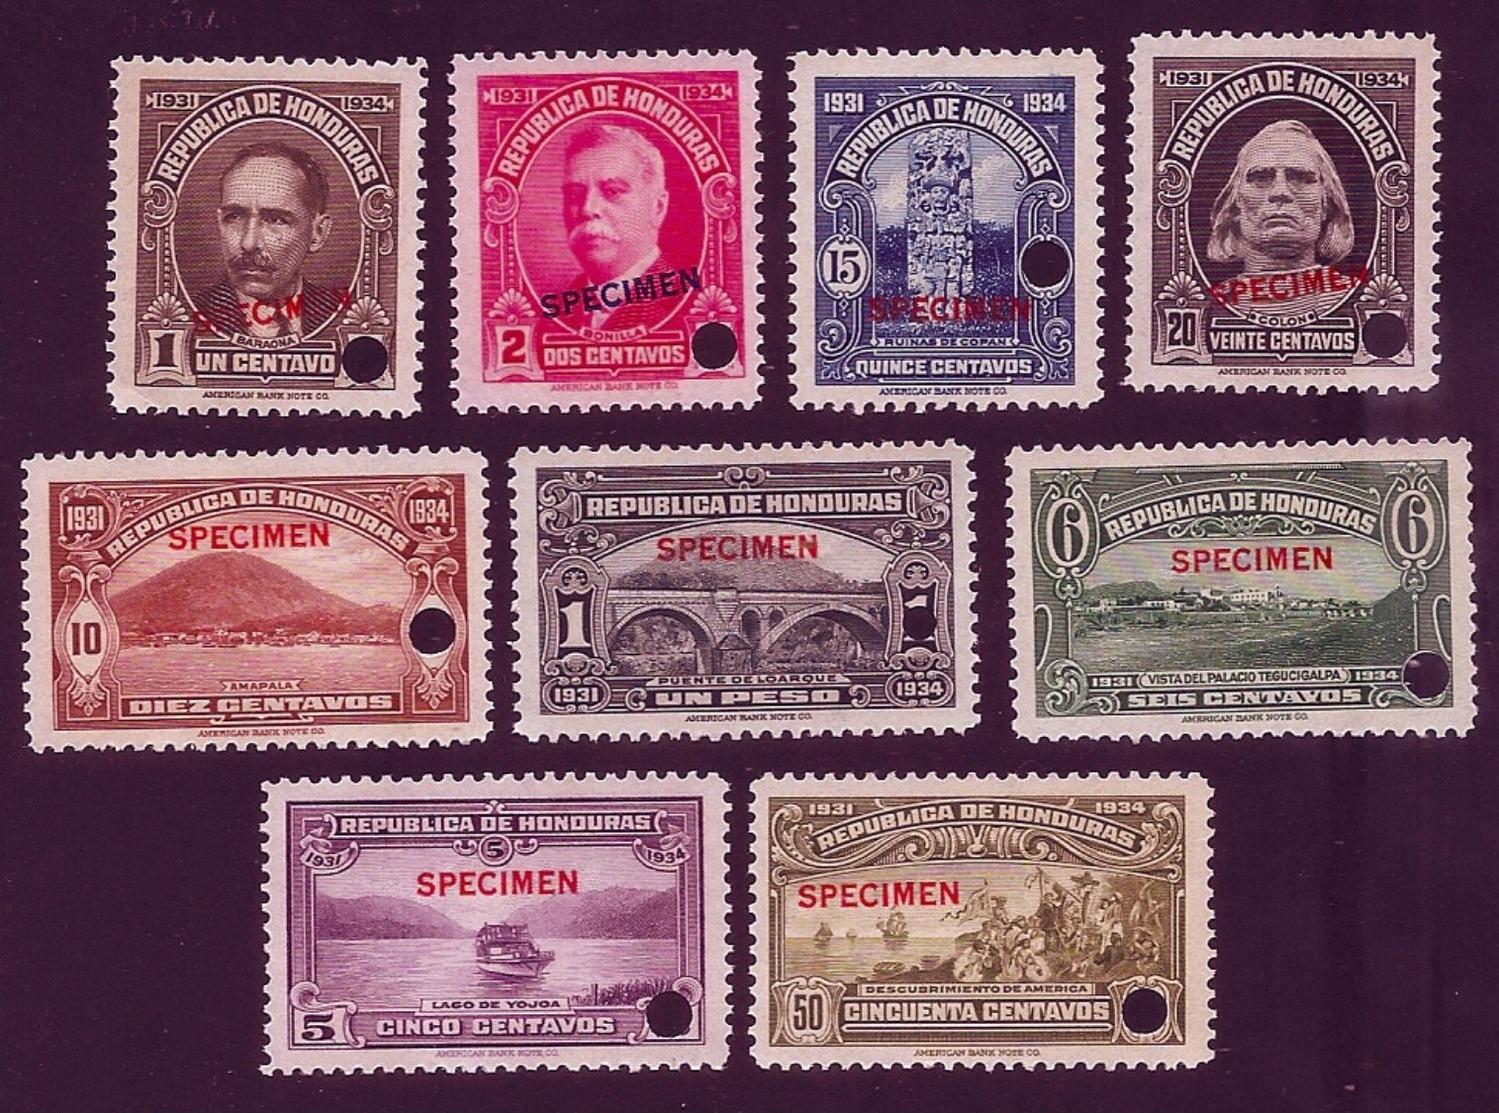 {{{ LATIN AMERICA  HONDURAS 1931 Pictorial Set Of 9  SHIP BRIDGE SPECIMEN AMERICAN BANK COMPANY MNH }}} - Honduras